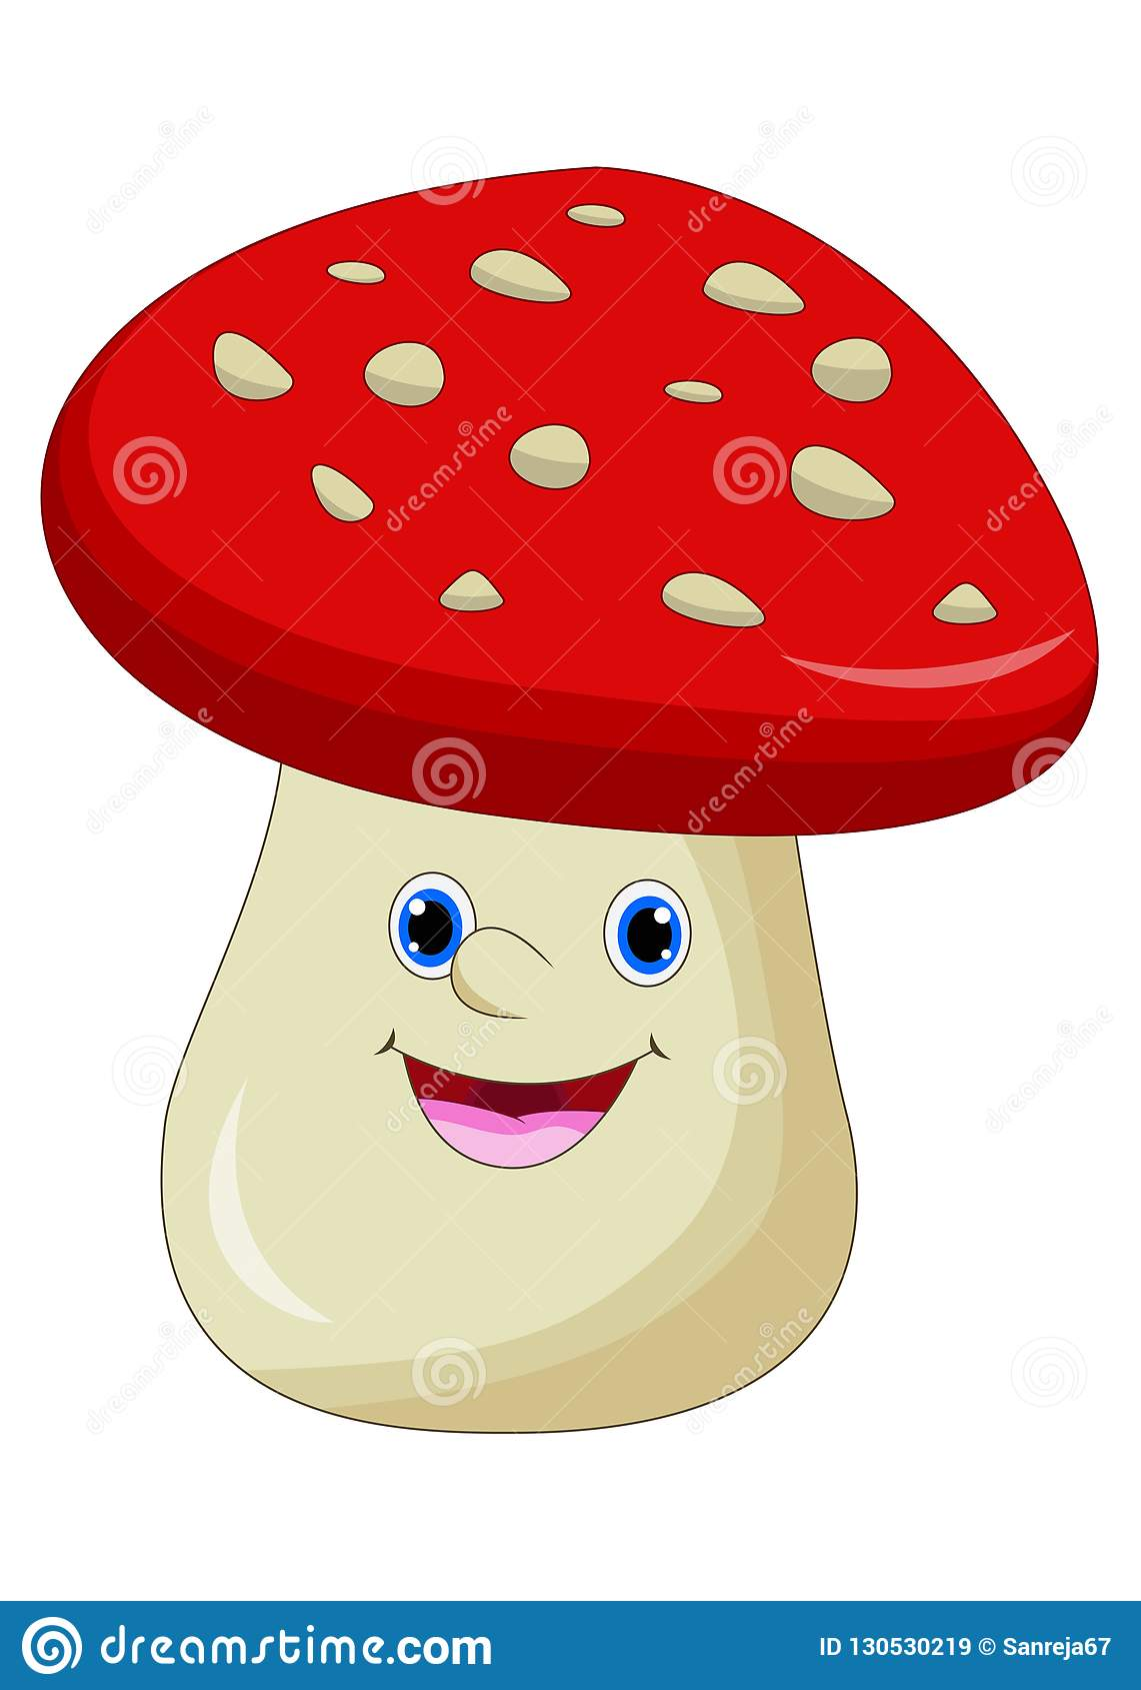 Cartoon Mushroom Cartoon Vector